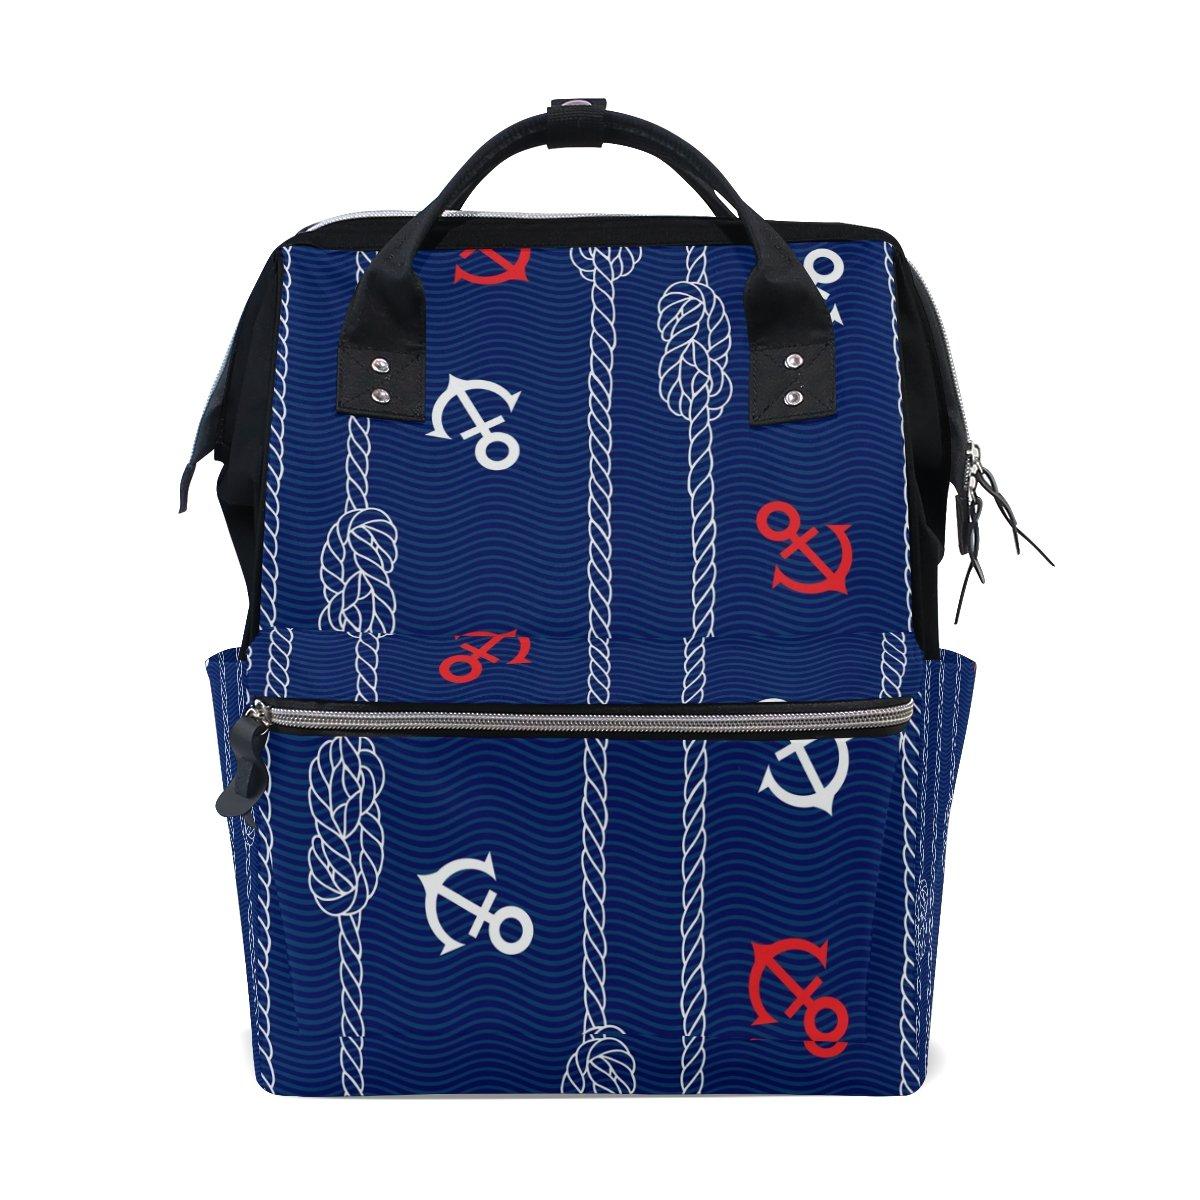 ALIREA Marine Rope And Anchors Diaper Bag Backpack, Large Capacity Muti-Function Travel Backpack